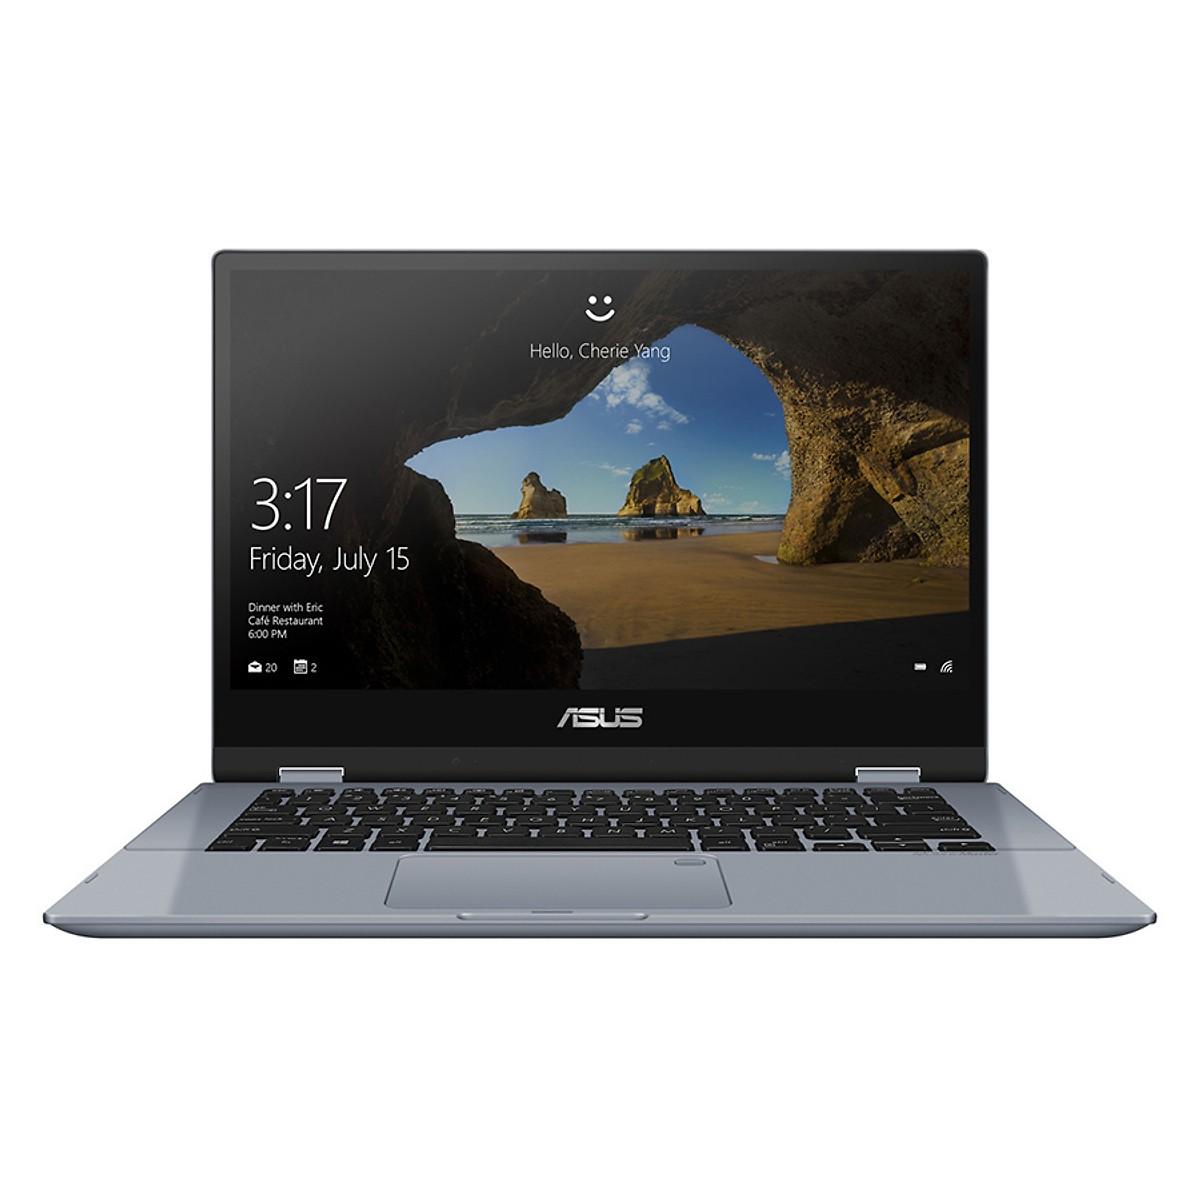 Asus   Máy tính xách tay - Laptop    Laptop Asus Vivobook Flip 14 TP412UA-EC101T Core i3-7020U/Win10